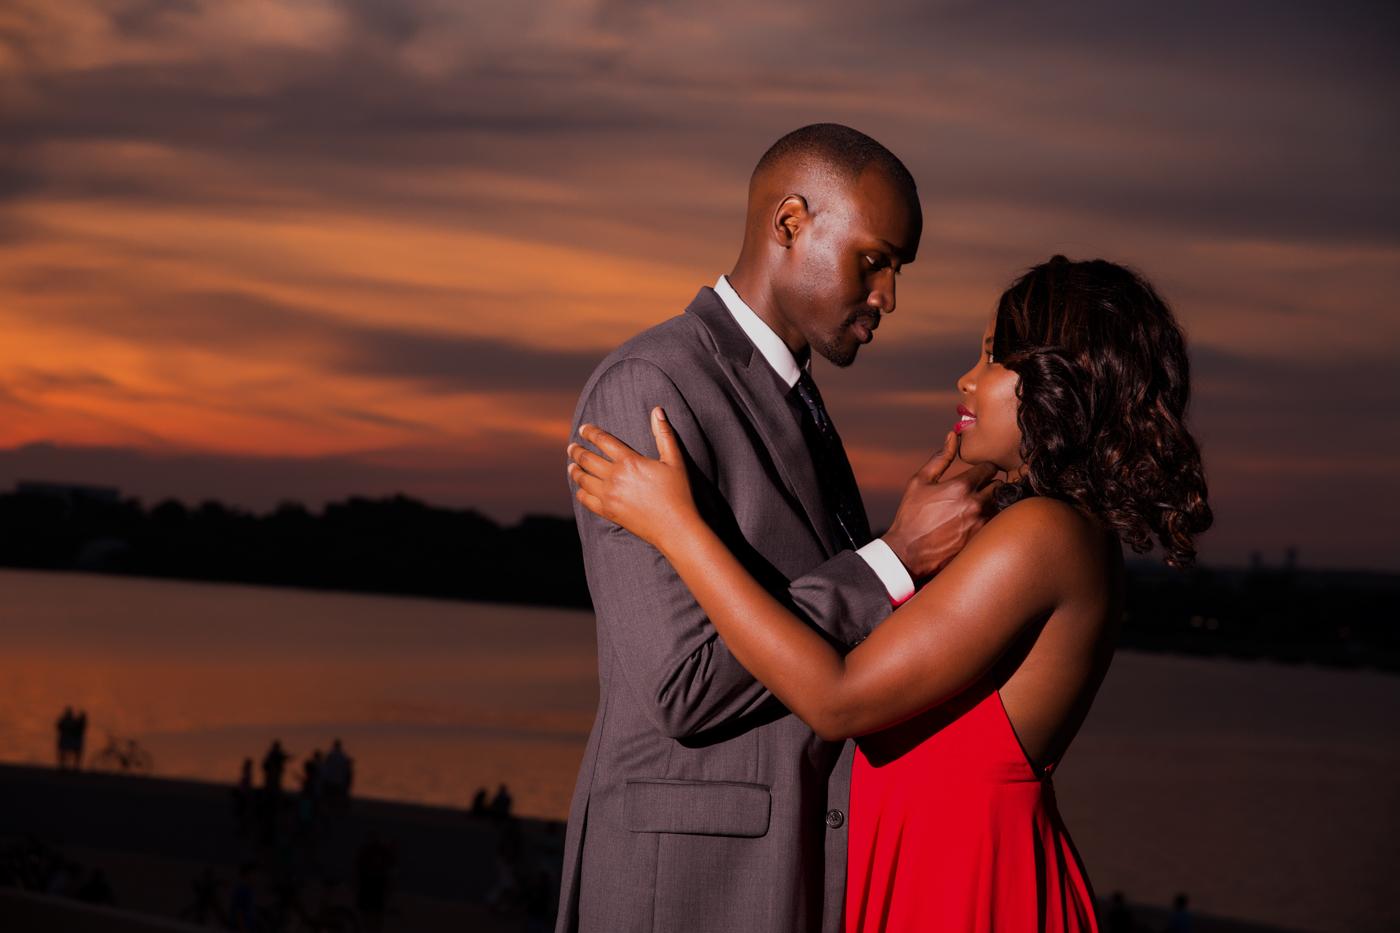 Jessica-Daniel-Engagement-Photo-Shoot-in-the-heart-of-Washington-DC-Ksenia-Pro-Photography-17